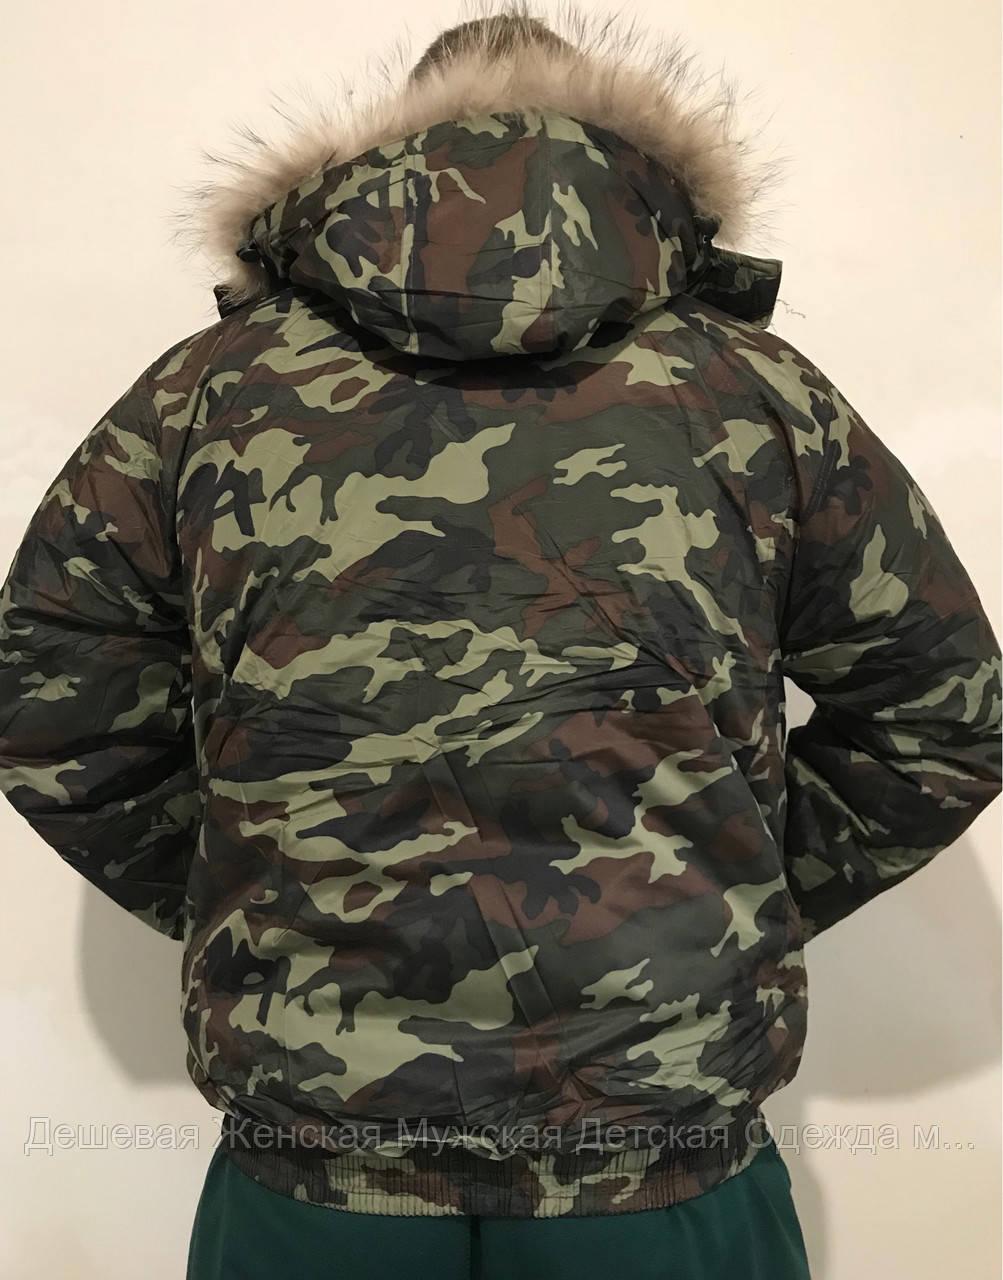 Куртка чоловіча зима к-сть Обмежена